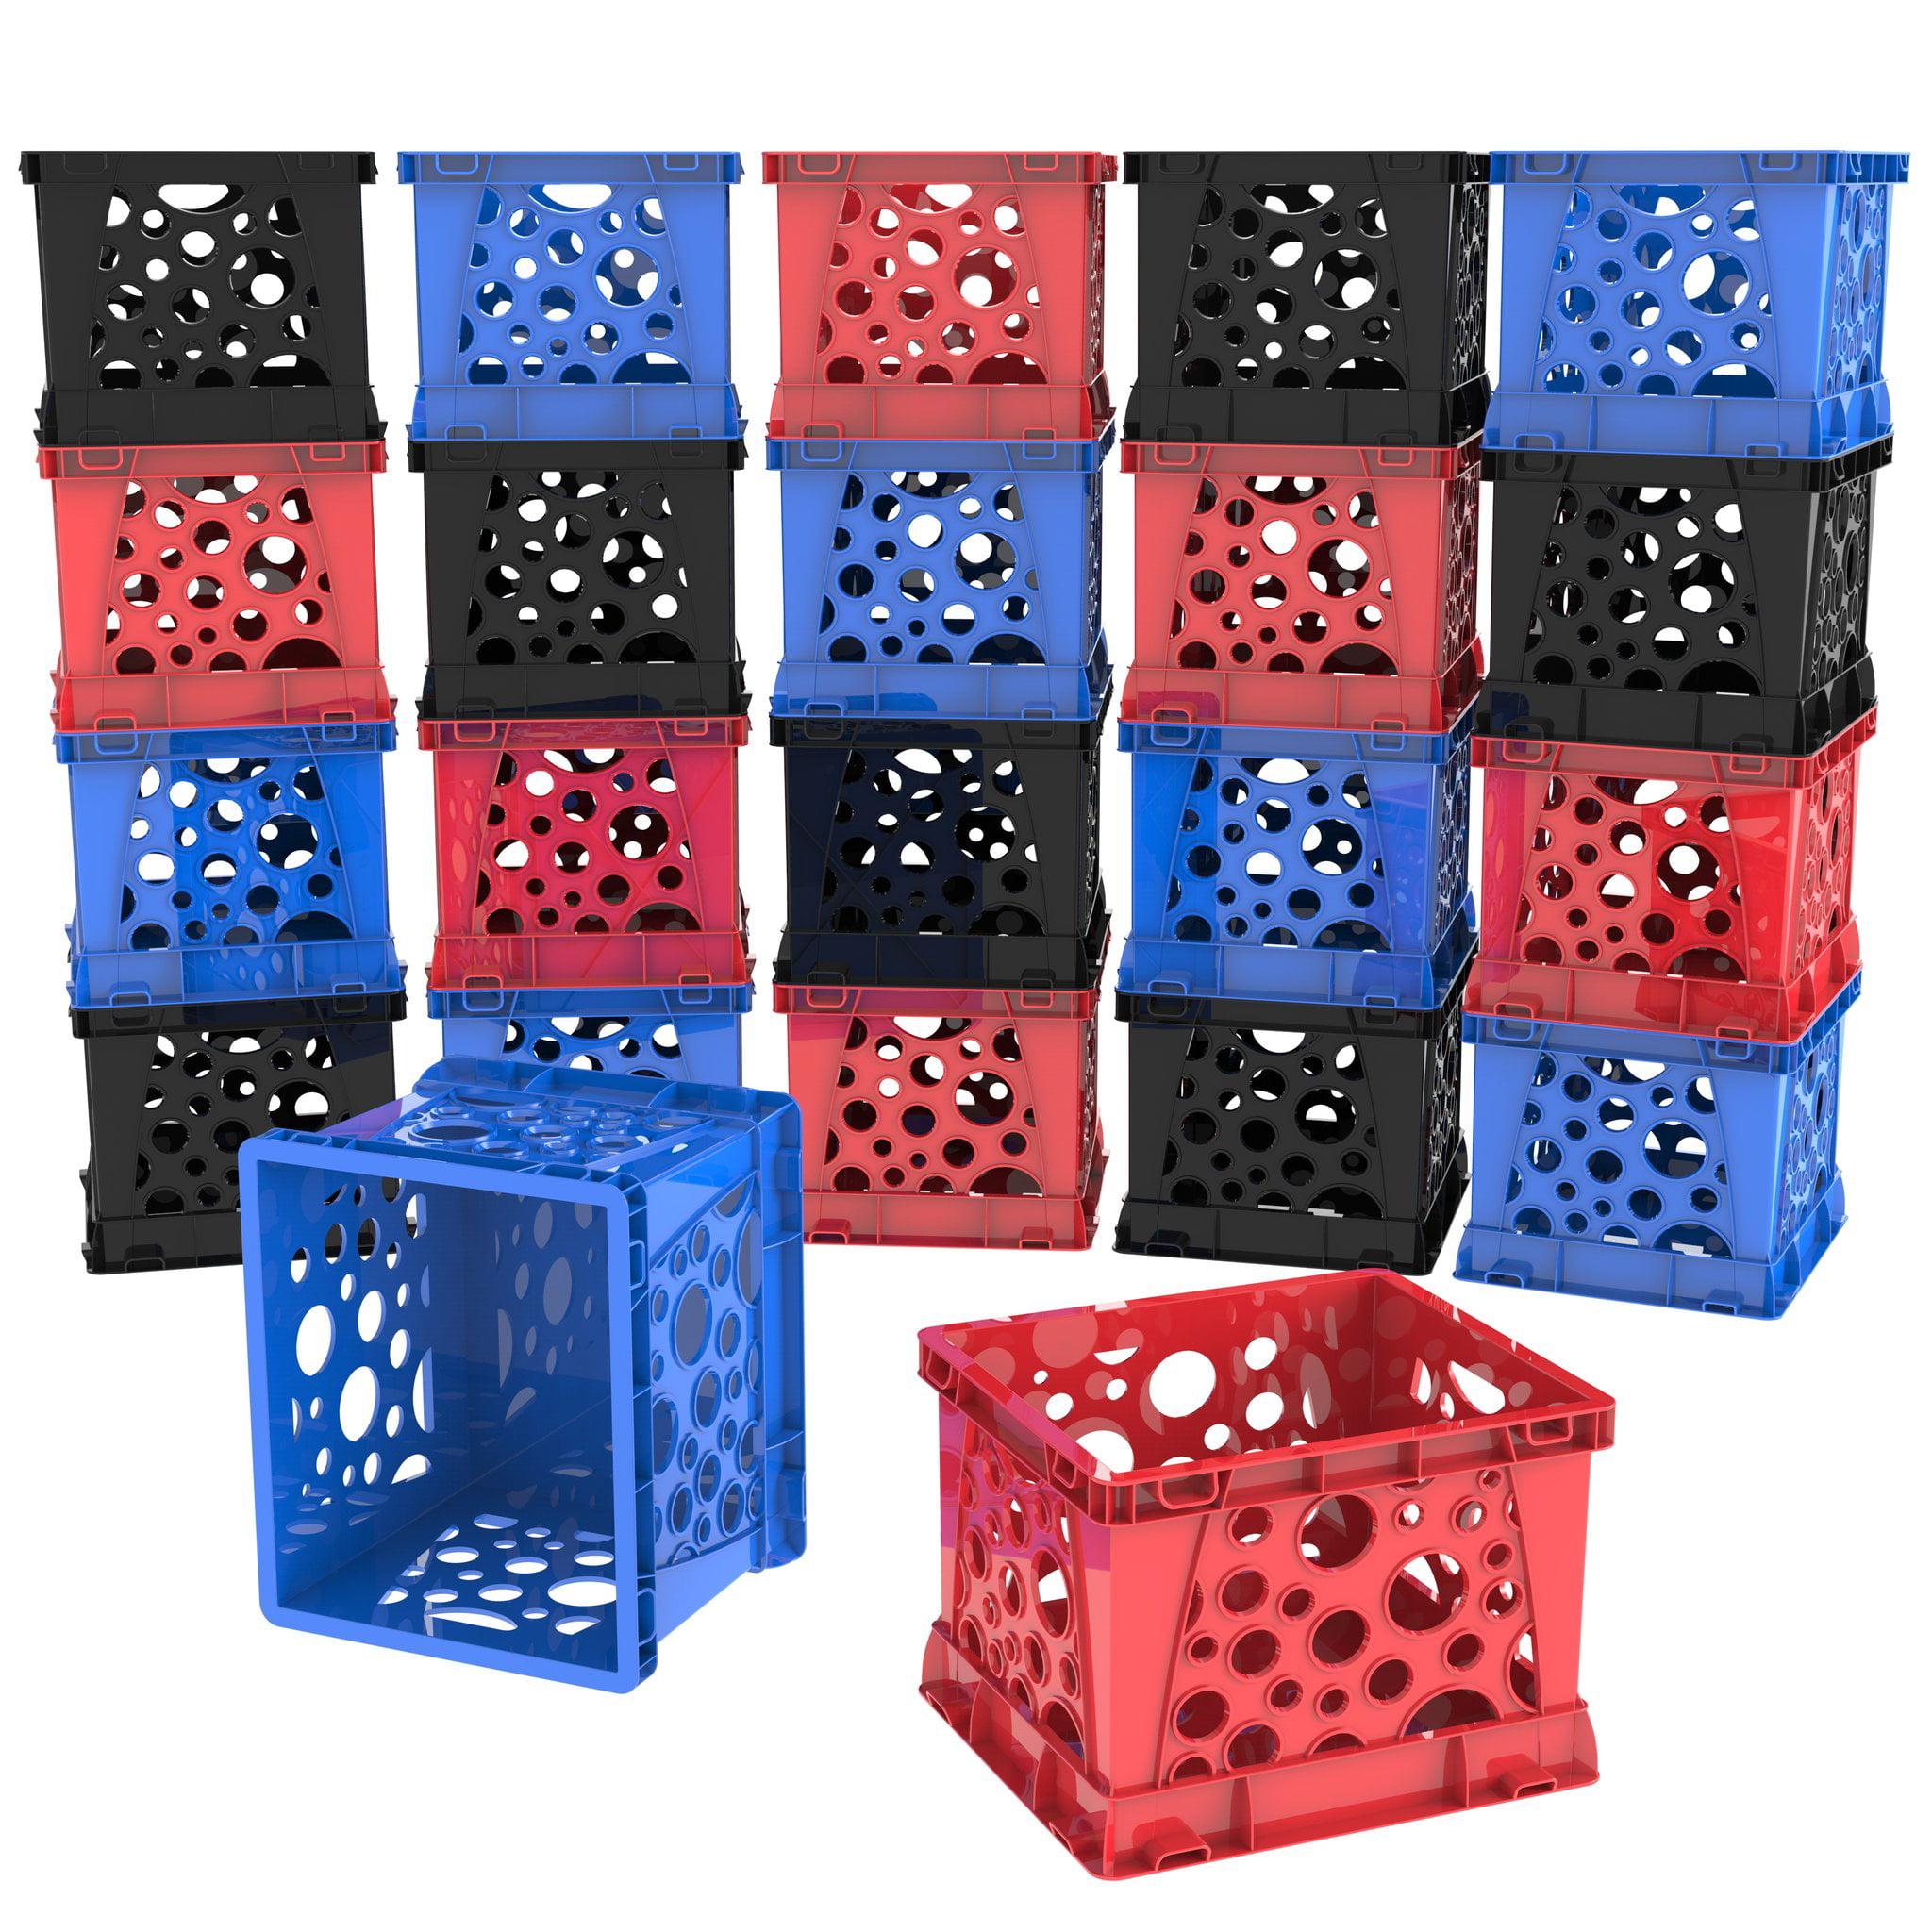 Storex Micro Crate (Lot of 18 units/ bulk pack)